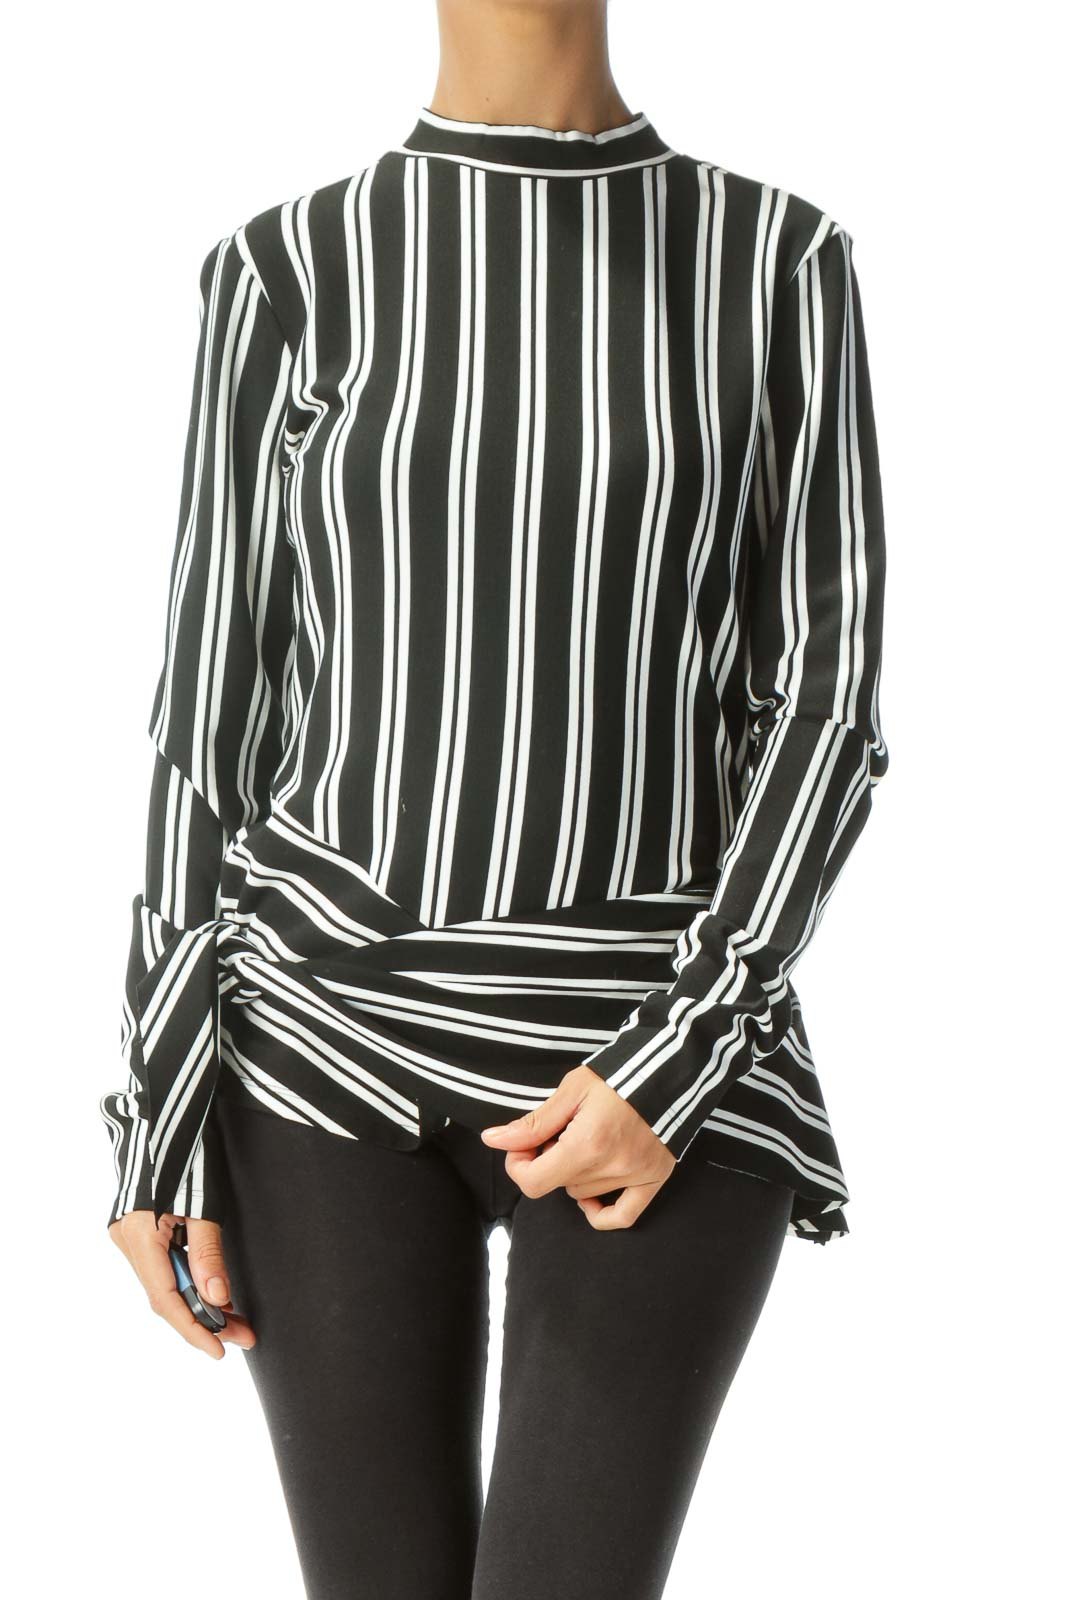 Black White Striped Asymmetric Long Sleeve Knit Top Front